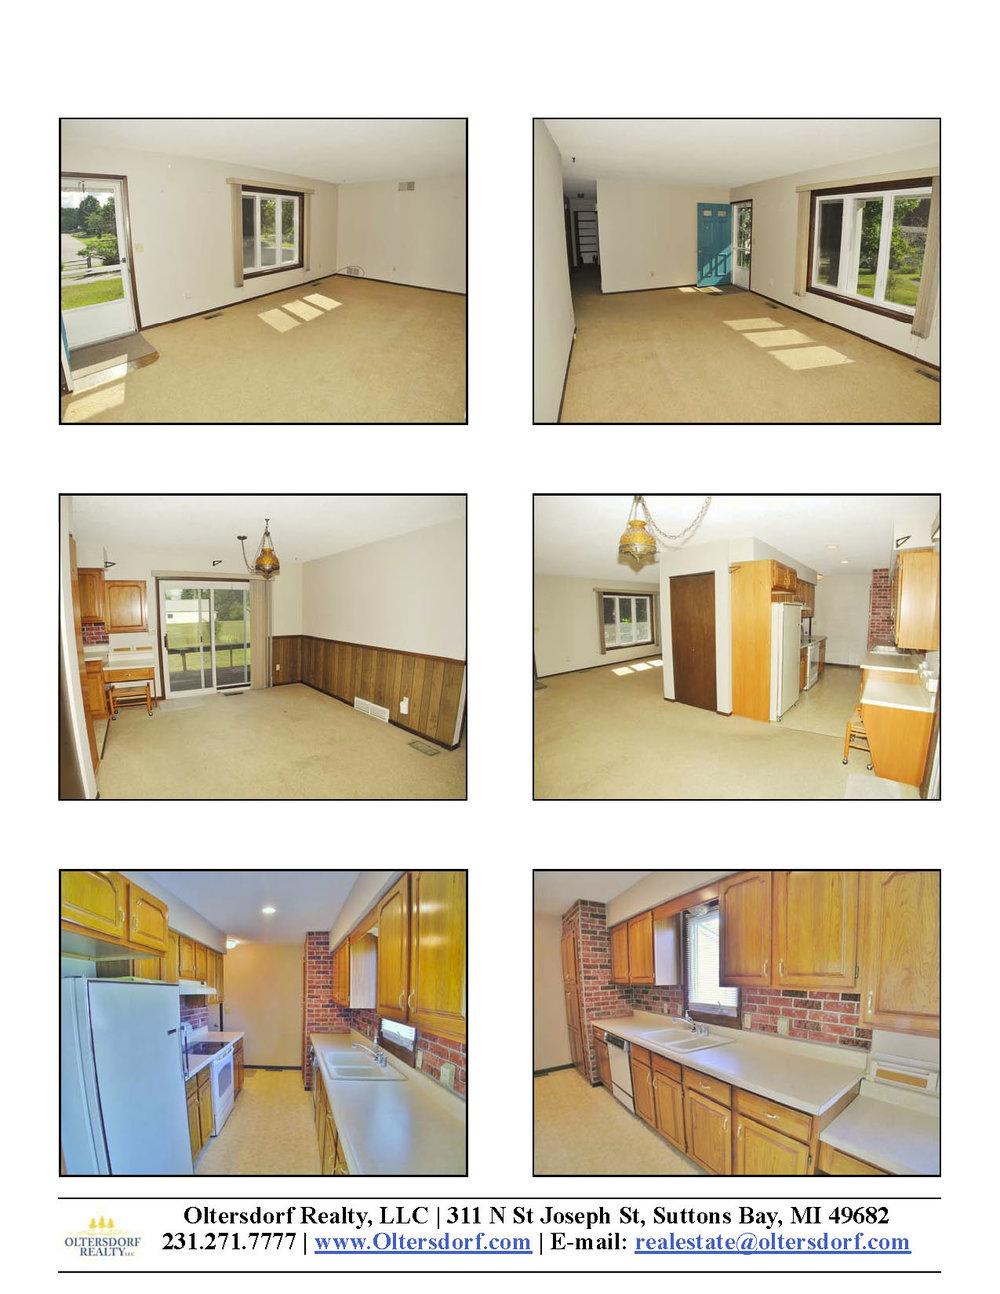 4903 Waldon Circle, Traverse City, MI – 3 Bedroom & 2 Bath Ranch Home for sale by Oltersdorf Realty LLC marketing packet (3).jpg